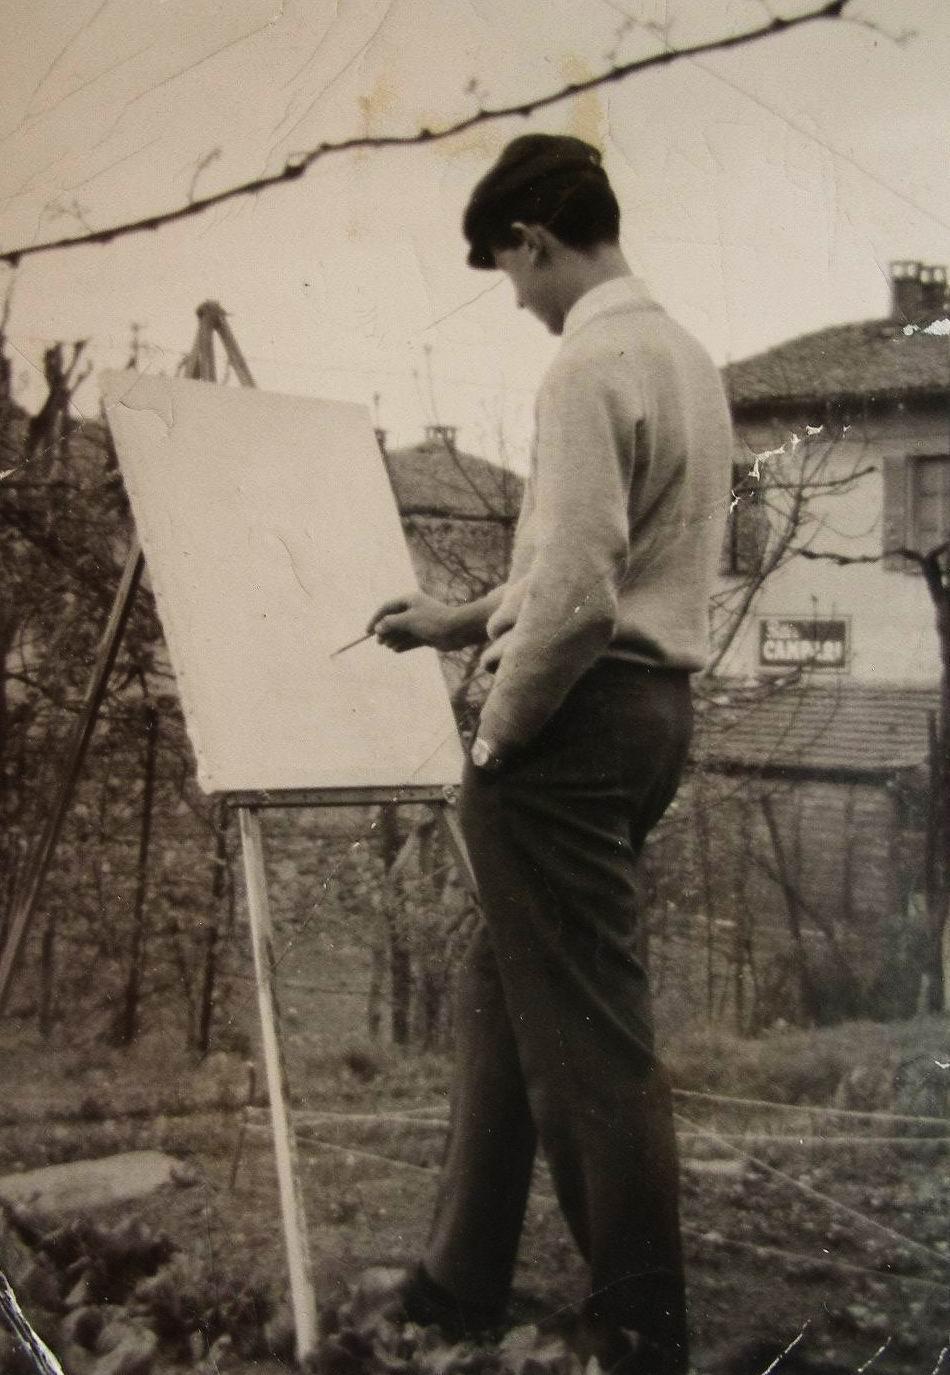 1965 Cavaria (VA) Italia, pintando al aire libre